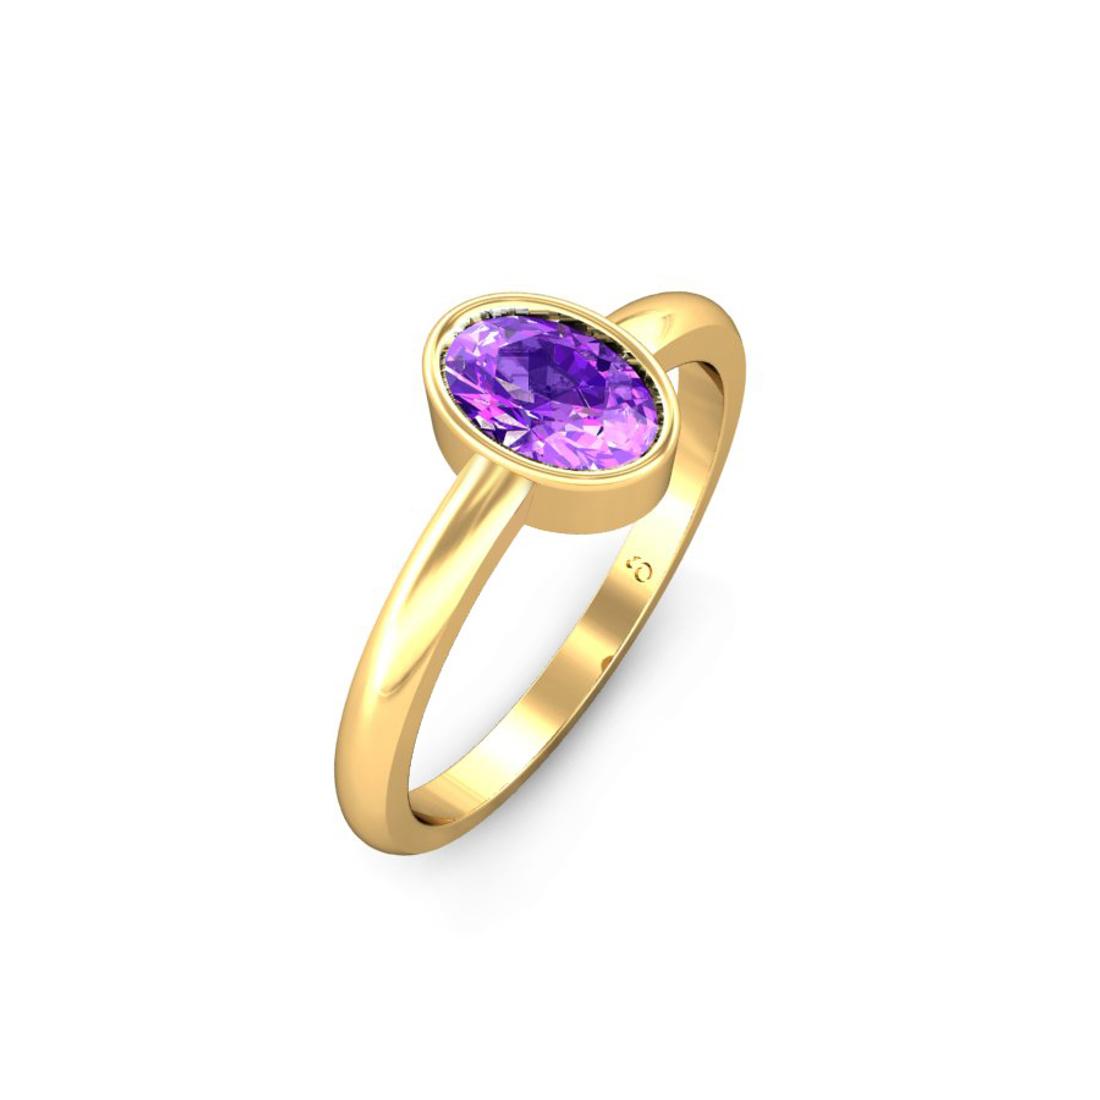 Jewel samarth 18k(750) BIS Hallmark Yellow Gold Akira Amethyst Ring (CGL Certified)